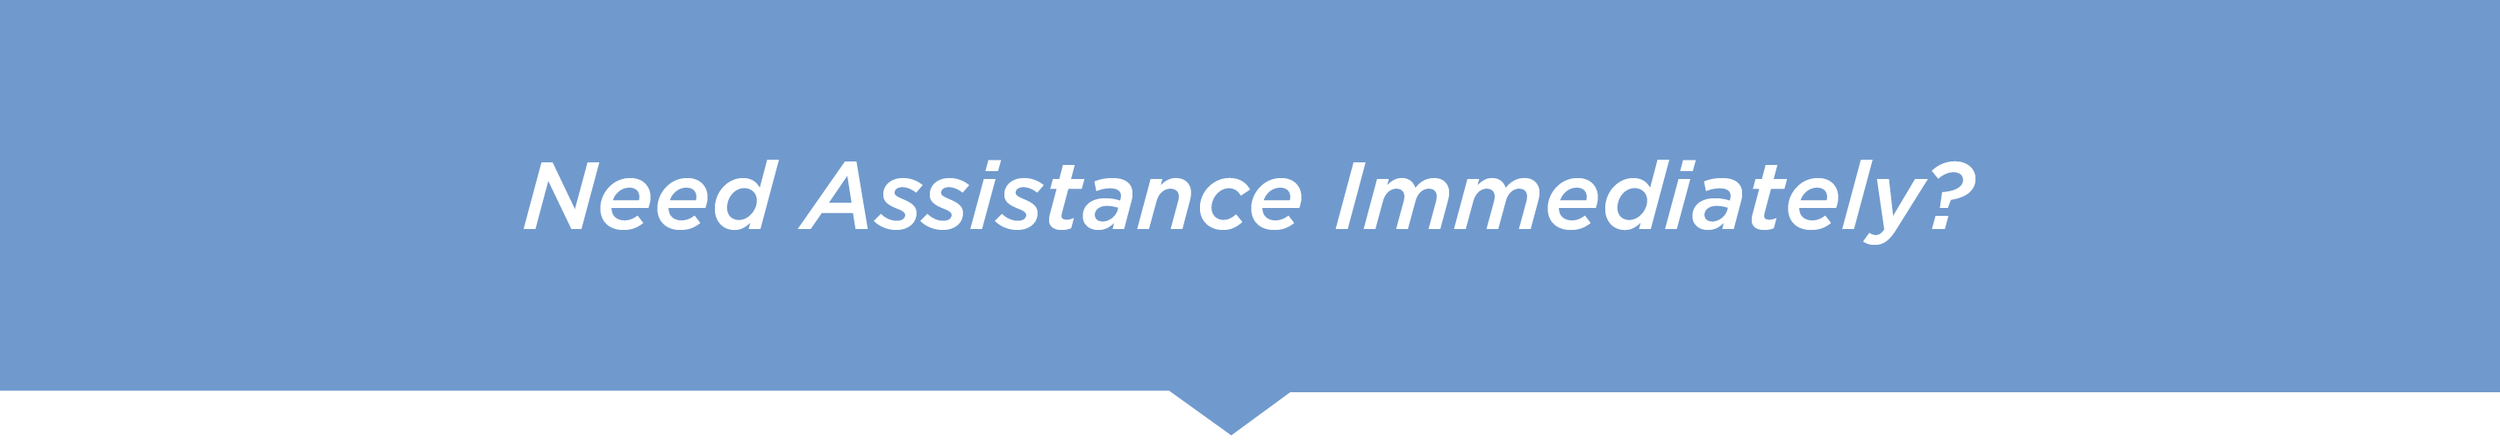 midbanner_needassistance.png